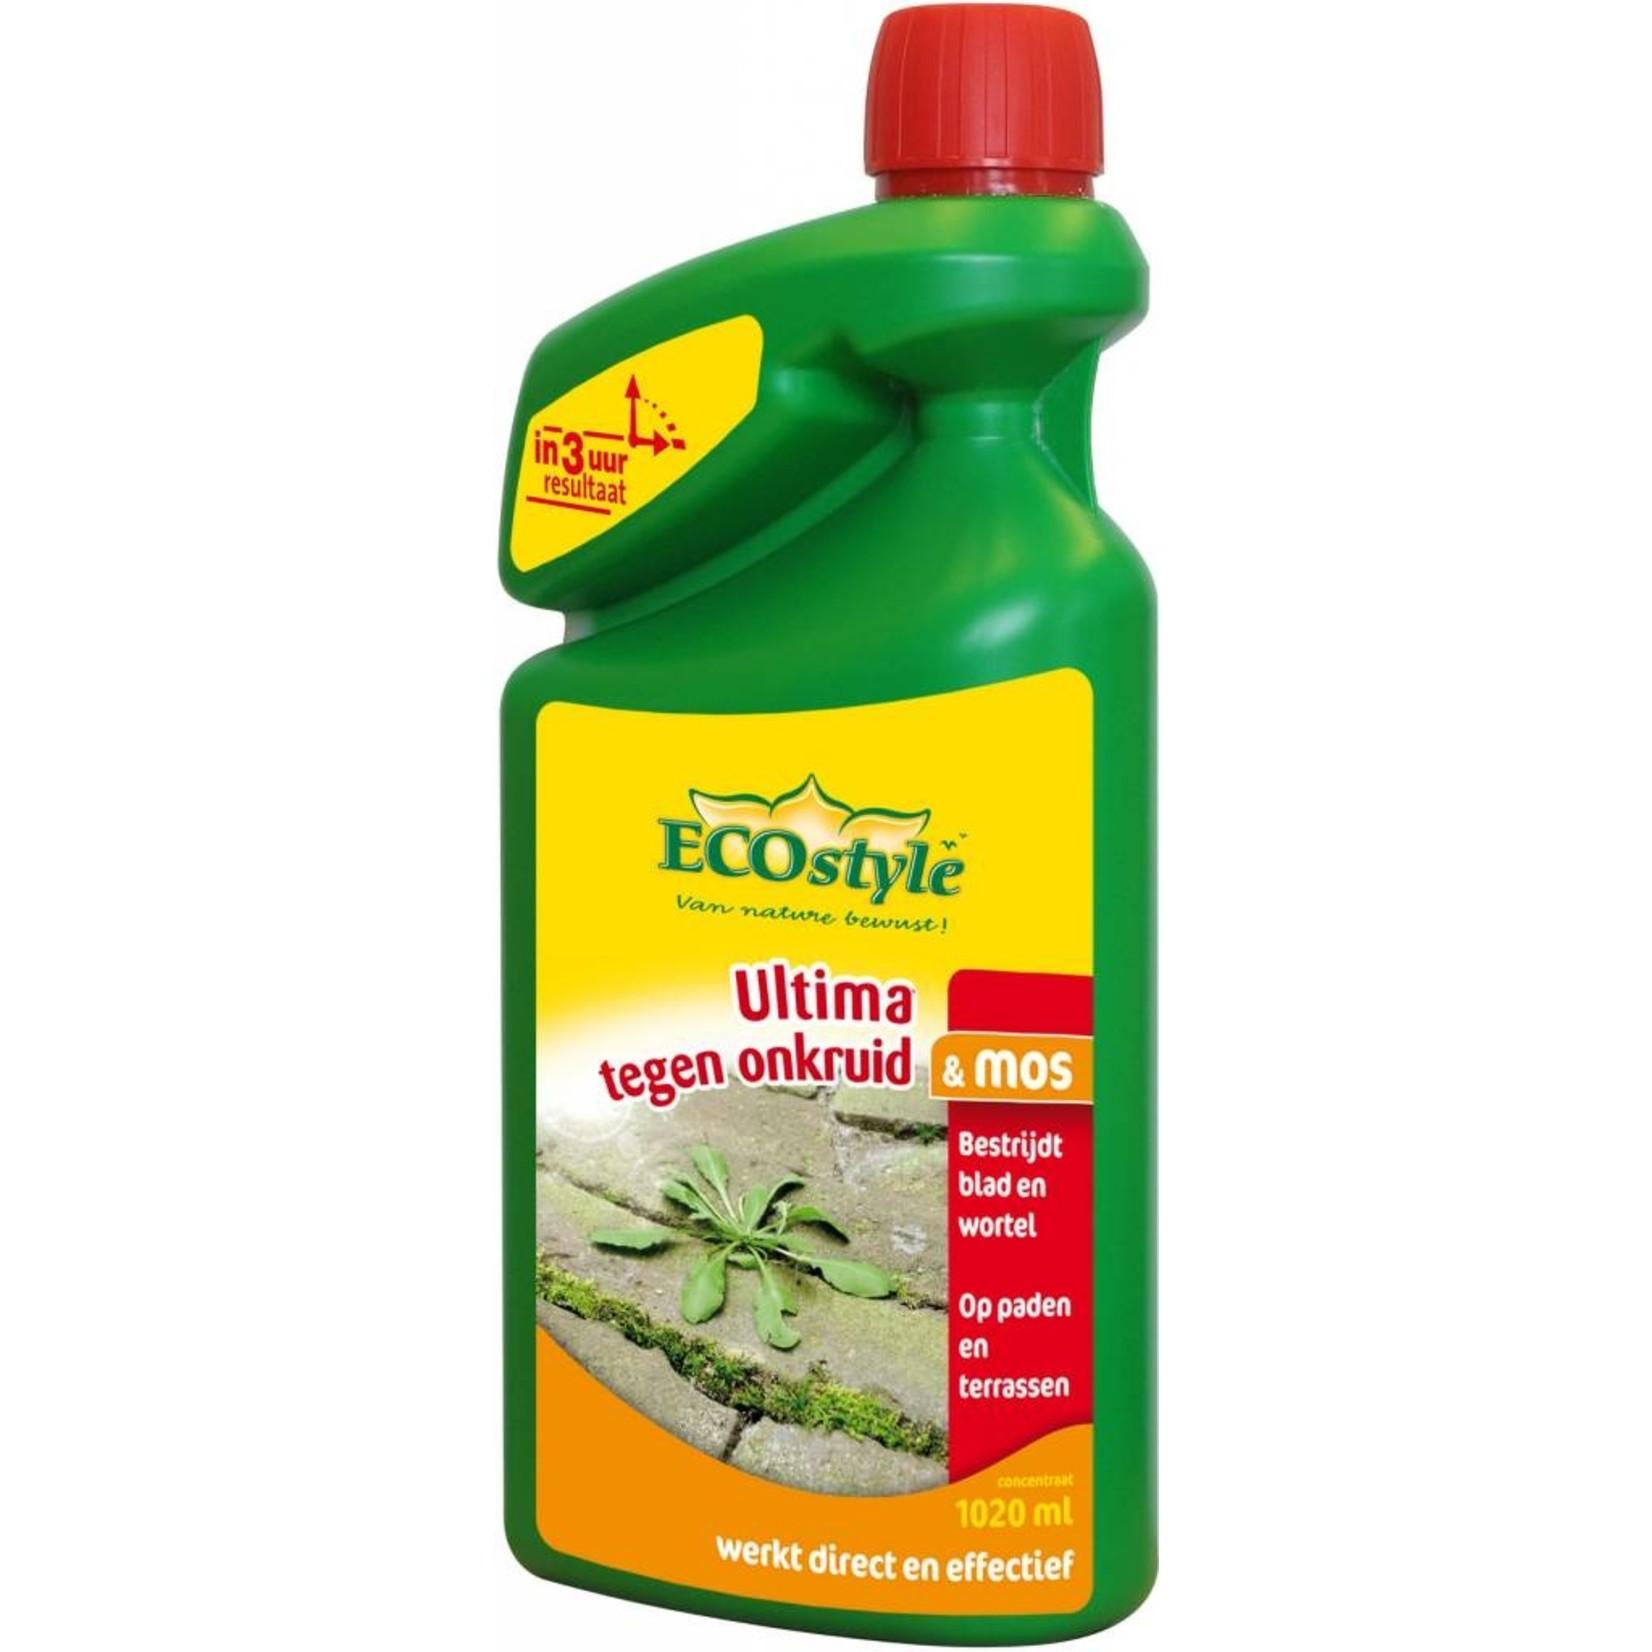 Ecostyle Ultima tegen onkruid & mos 1020 ml (concentraat)